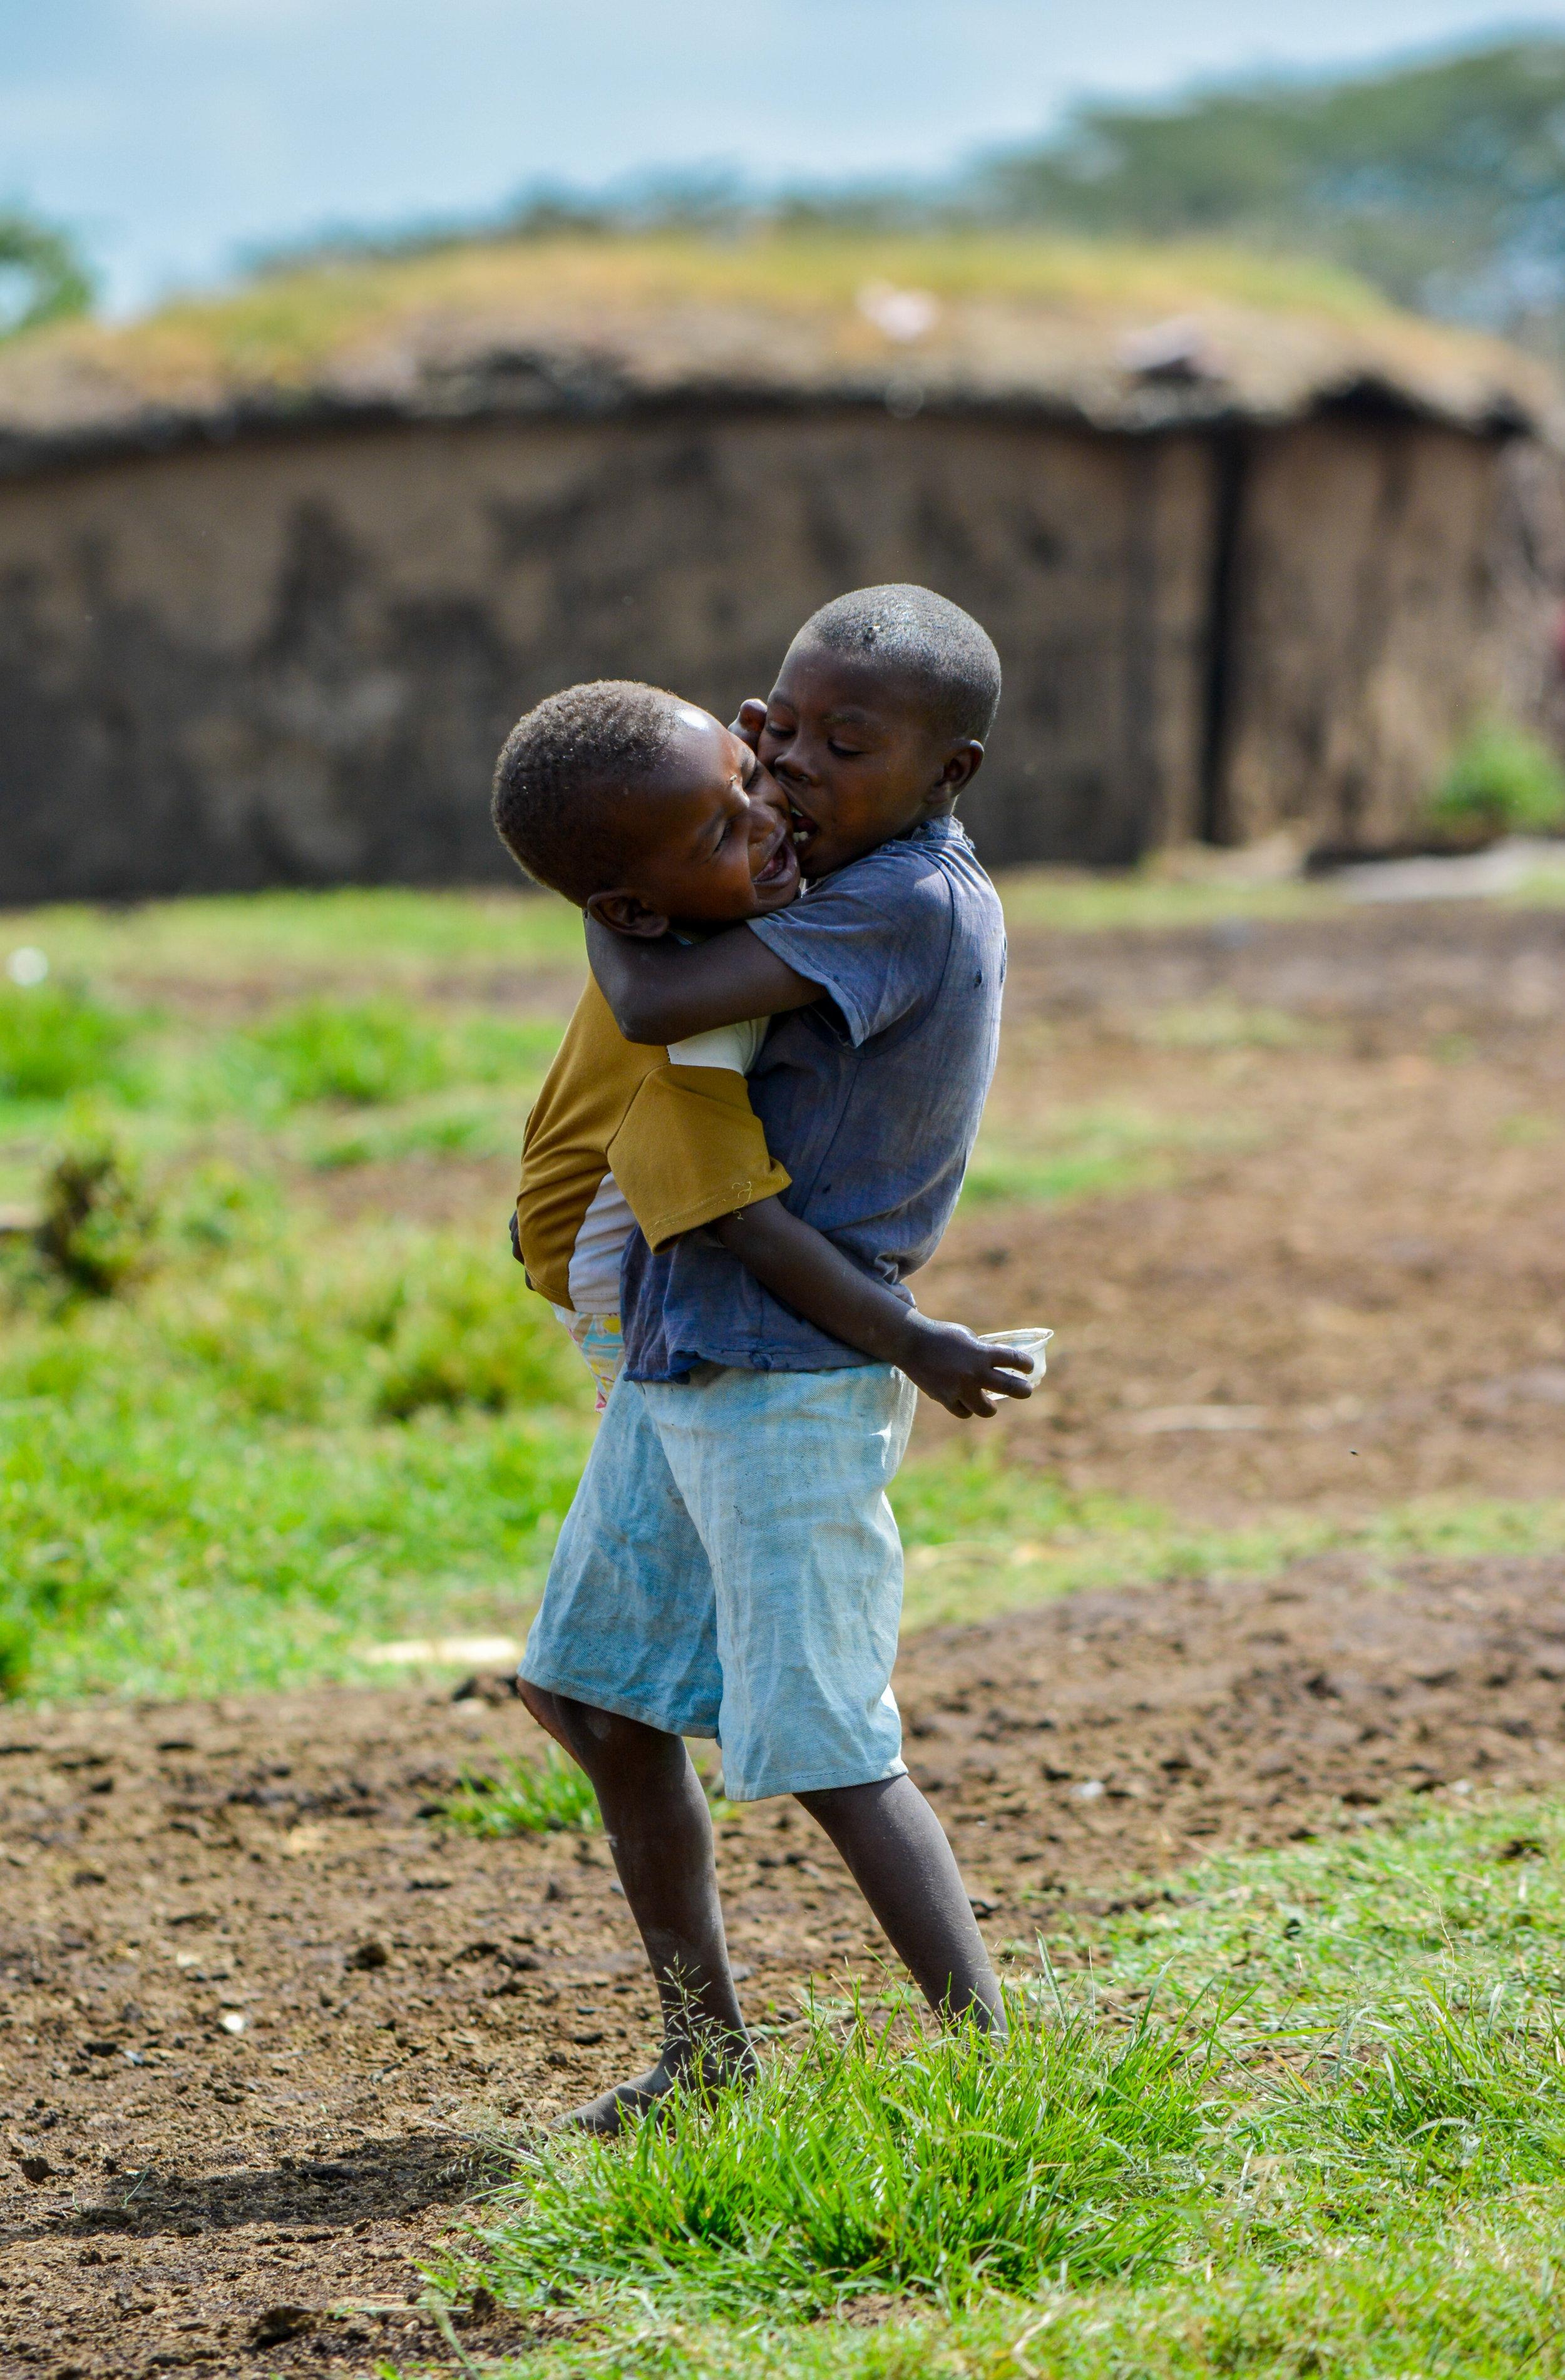 2 hours to travel to the nearest hospital - Migori County, Kenya